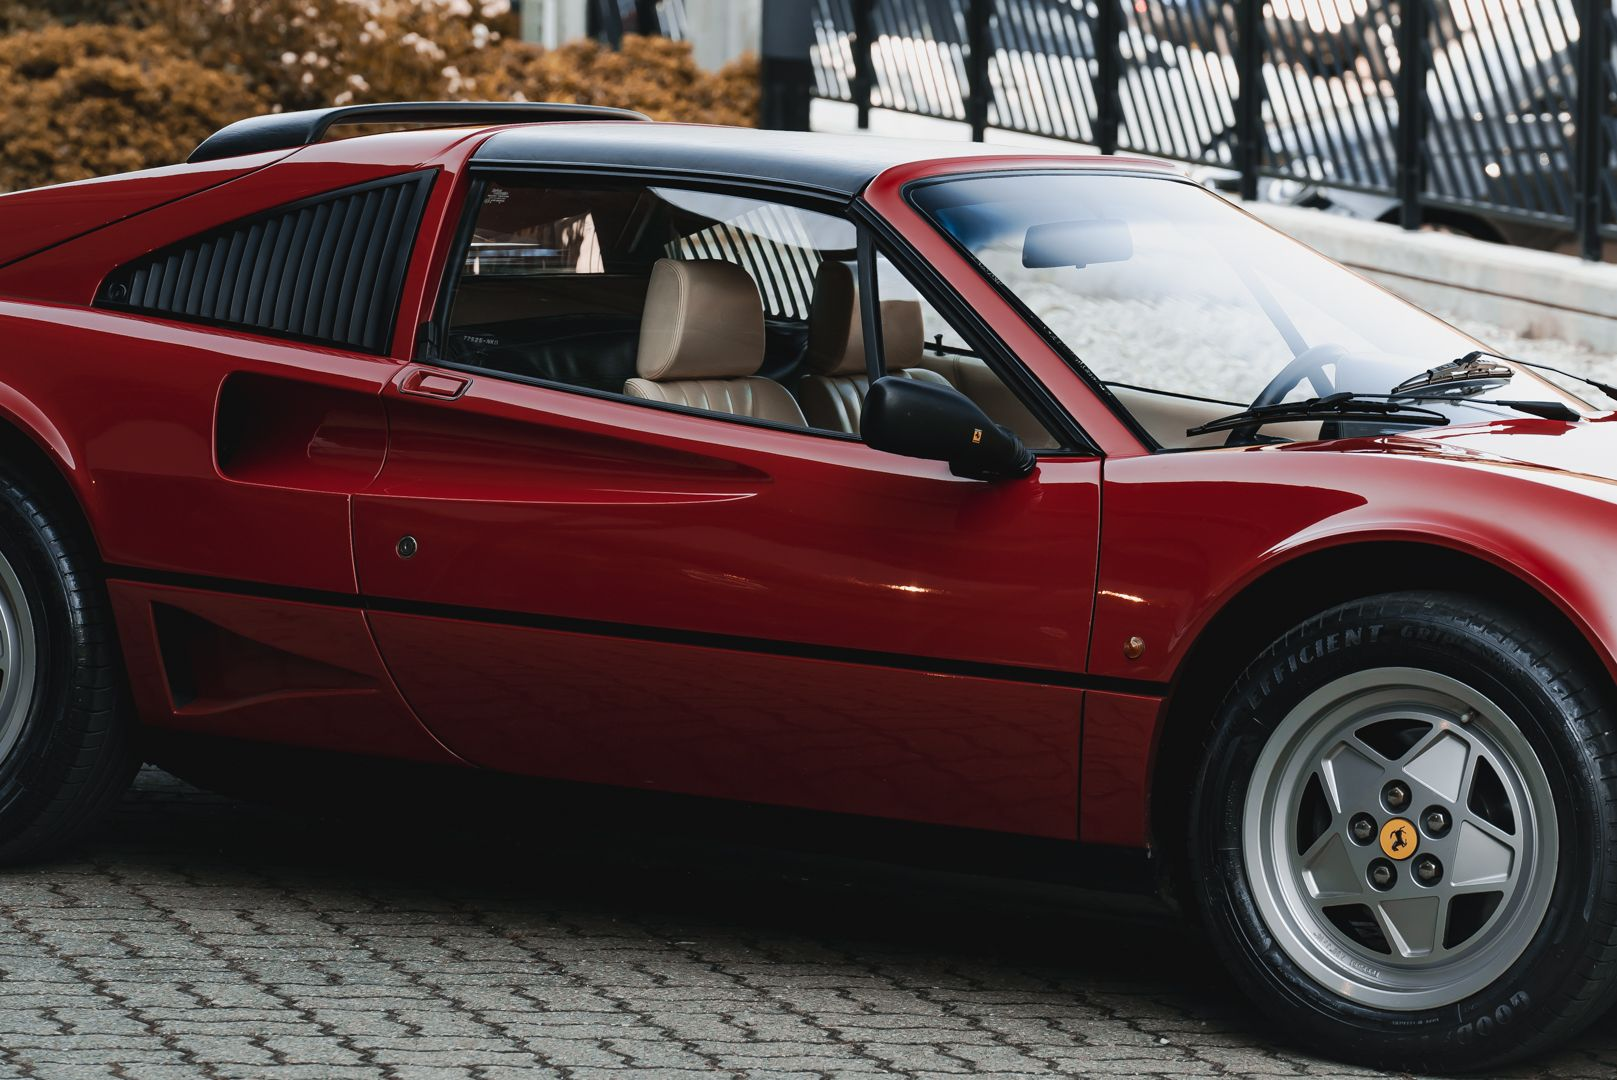 1988 FERRARI 208 GTS TURBO INTERCOOLER 75423